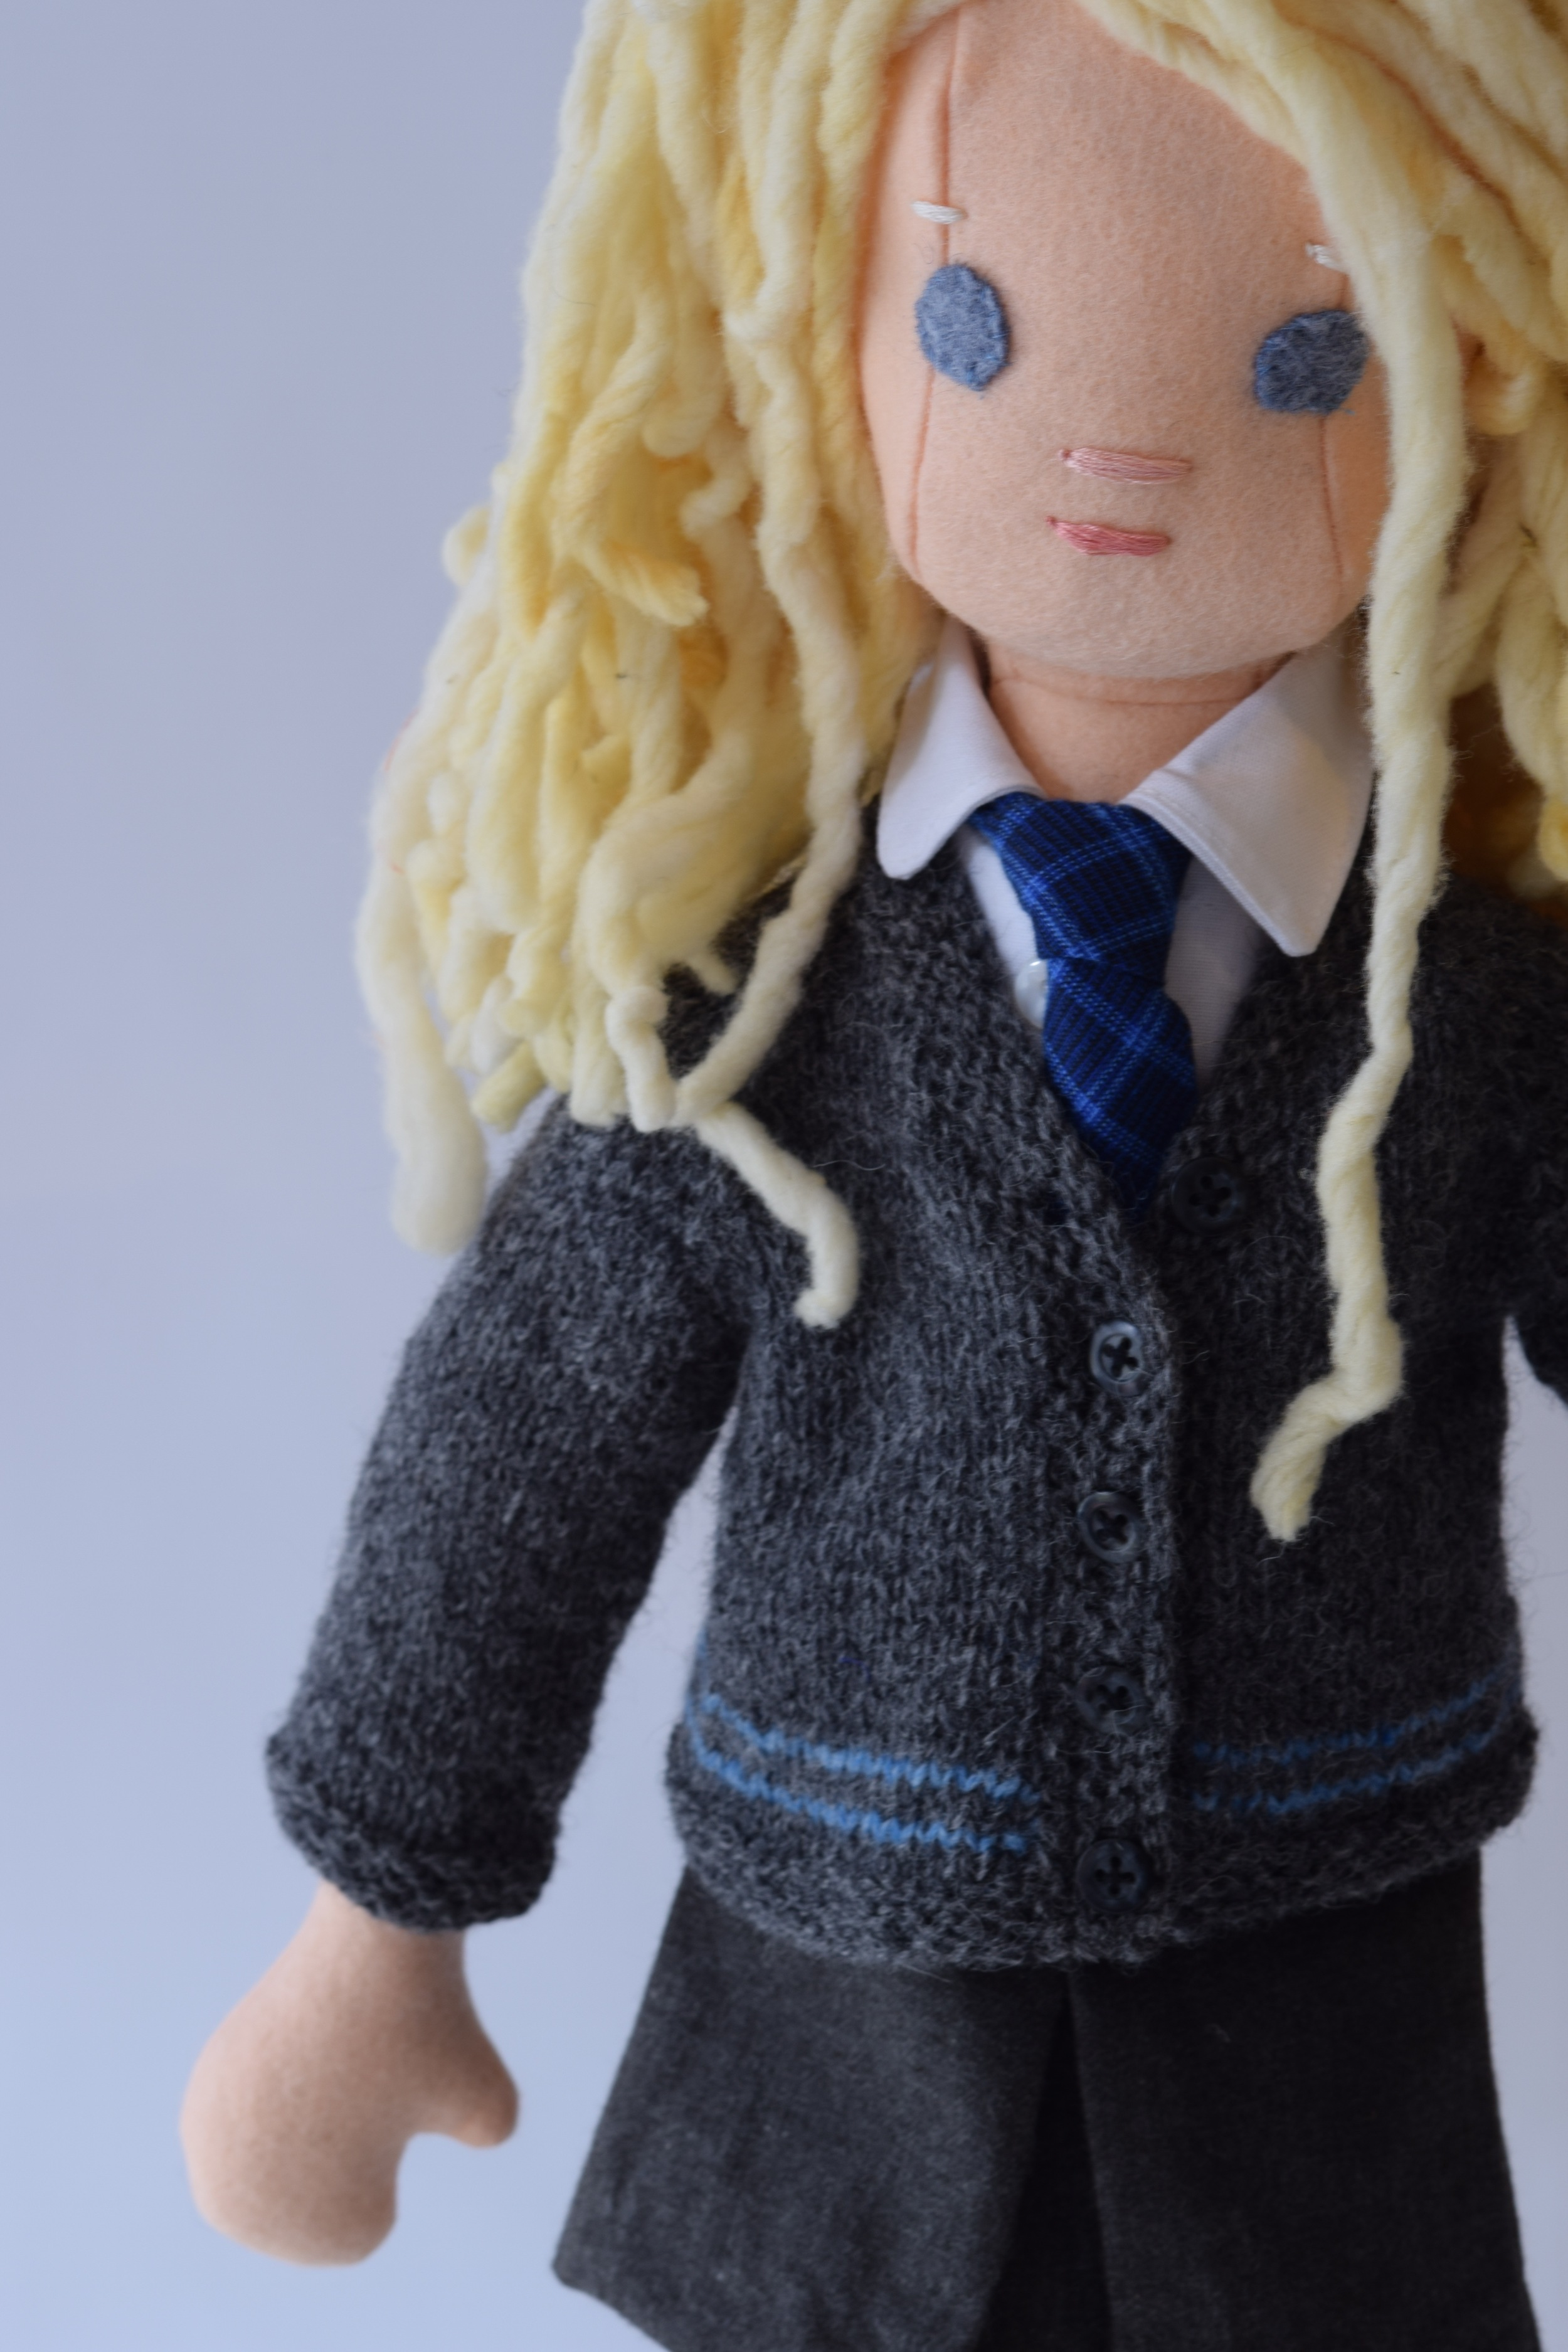 Luna Lovegood, A Harry Potter doll